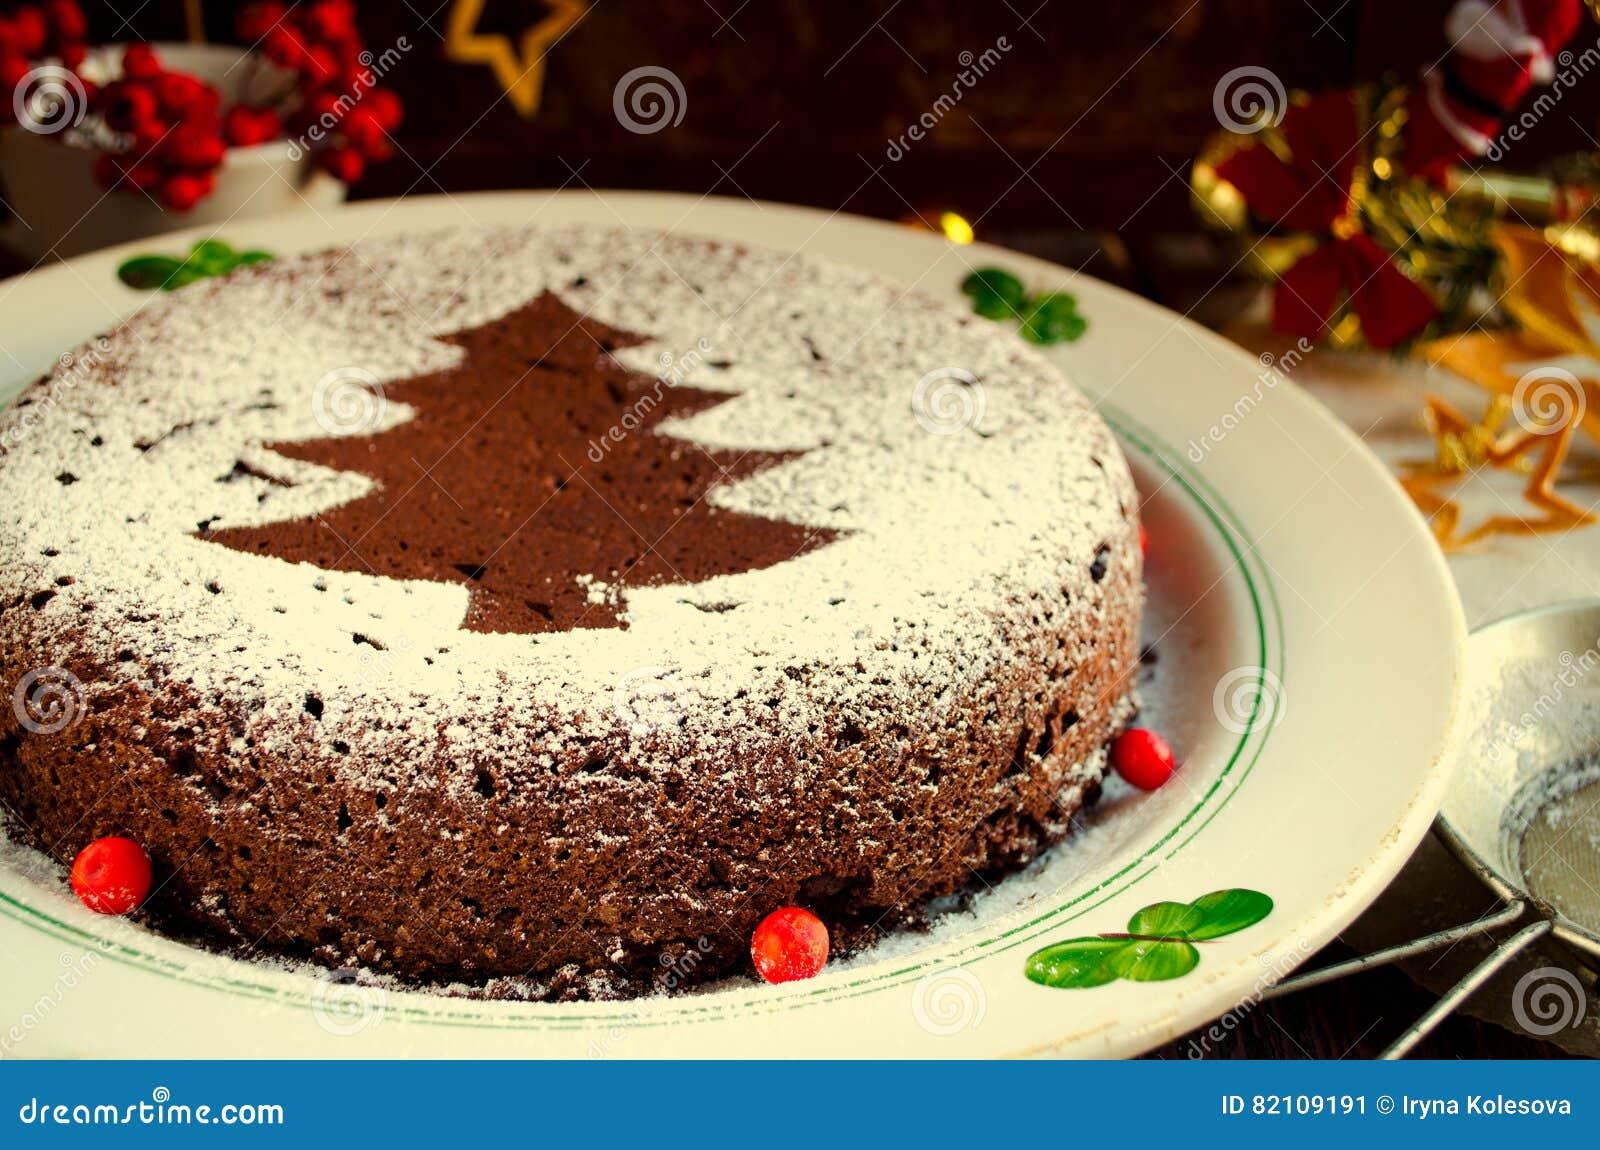 Traditional Homemade Chocolate Christmas Cake Sprinkled With Sugar